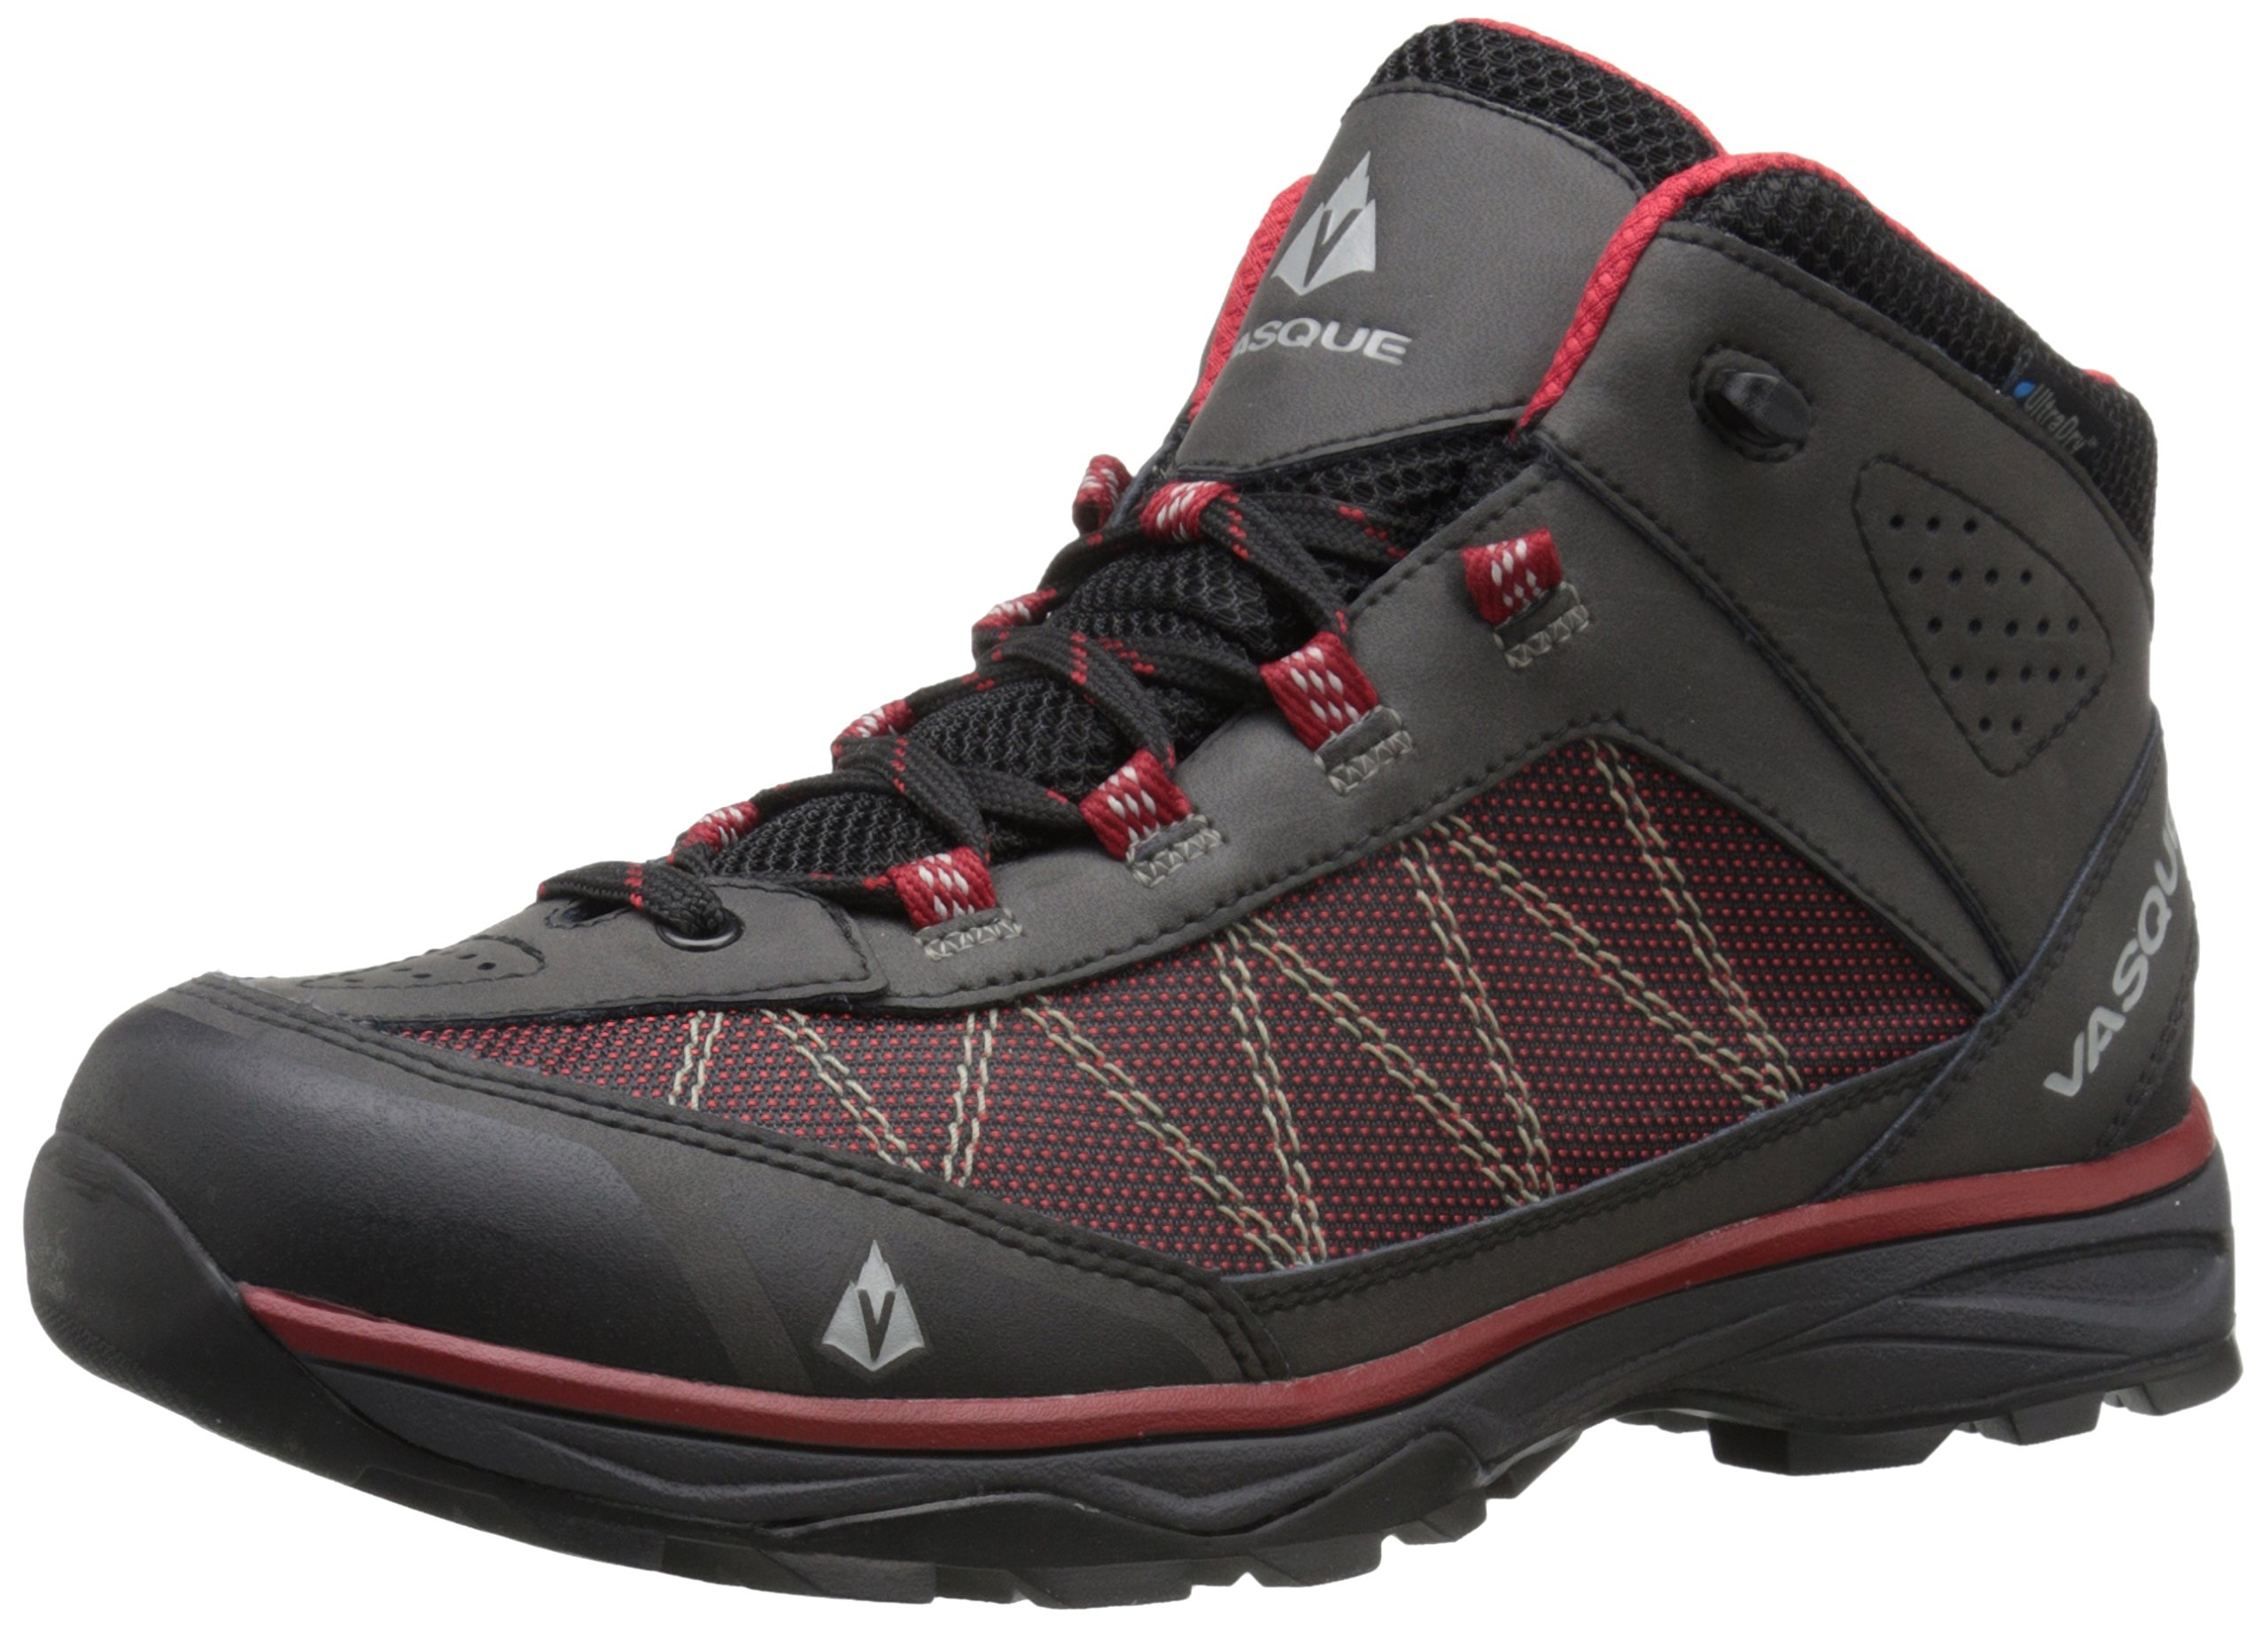 Vasque Men's Monolith Hiking Boot, Black/Chili Pepper, 10.5 W US